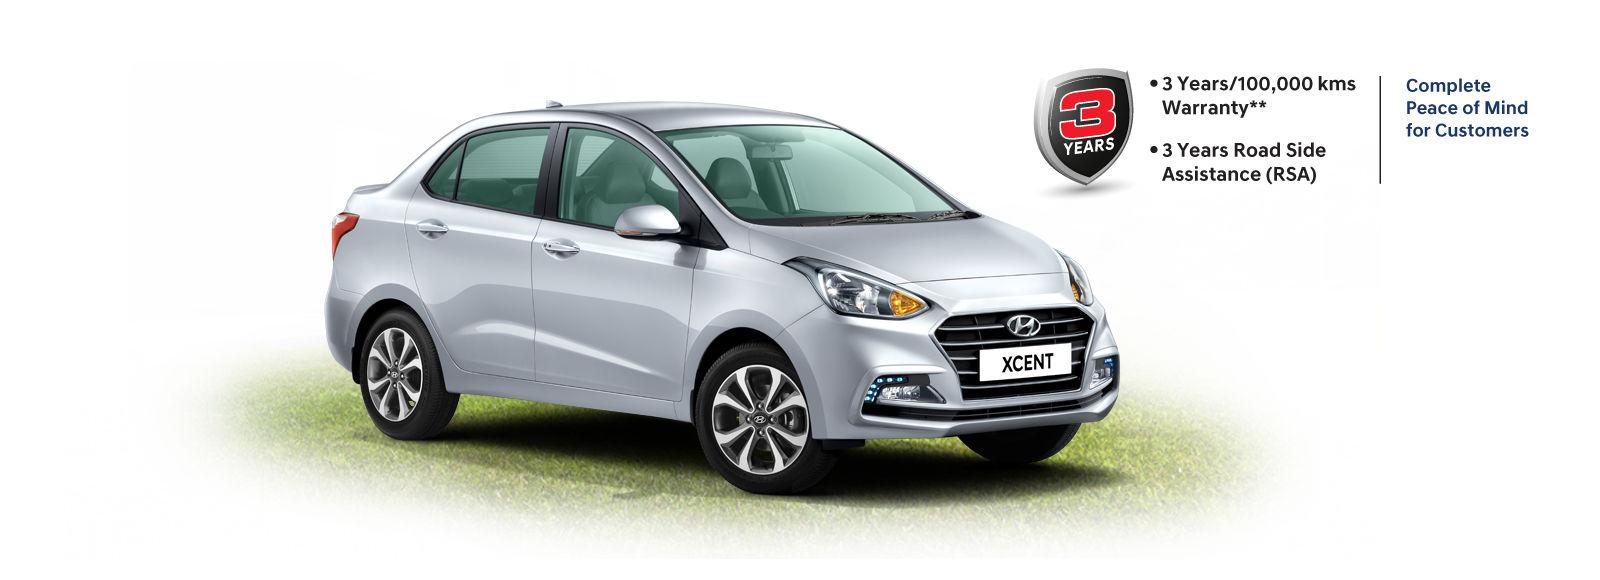 Xcent Highlights Compact Sedan Hyundai India